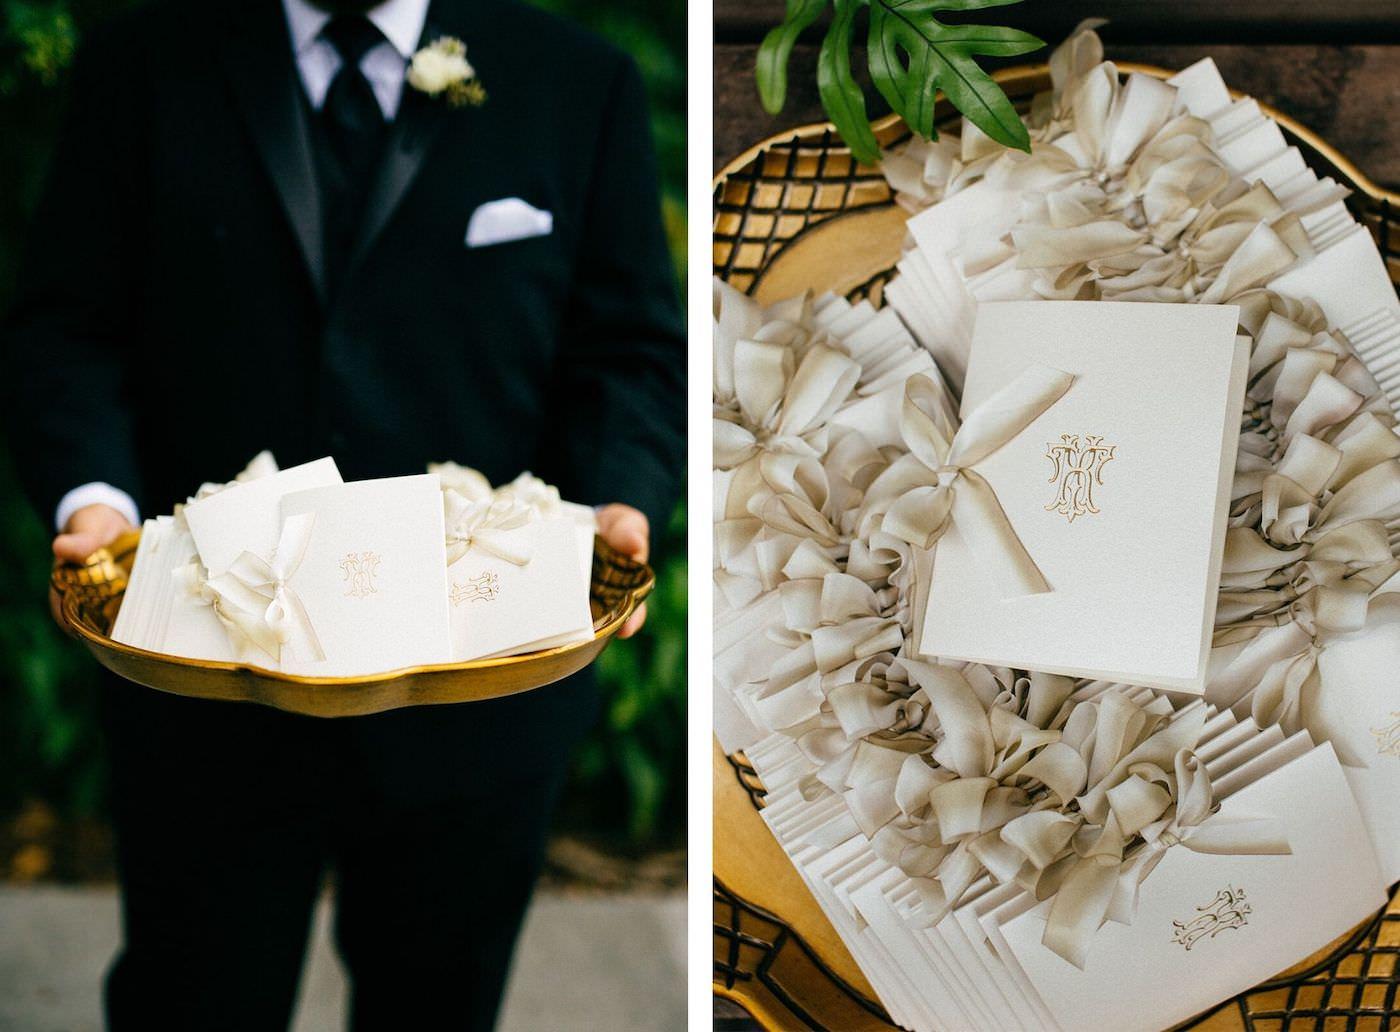 Sarasota Wedding Details, Elegant Florida Wedding Program with Ivory Ribbon, on Gold serving Tray   NK Weddings